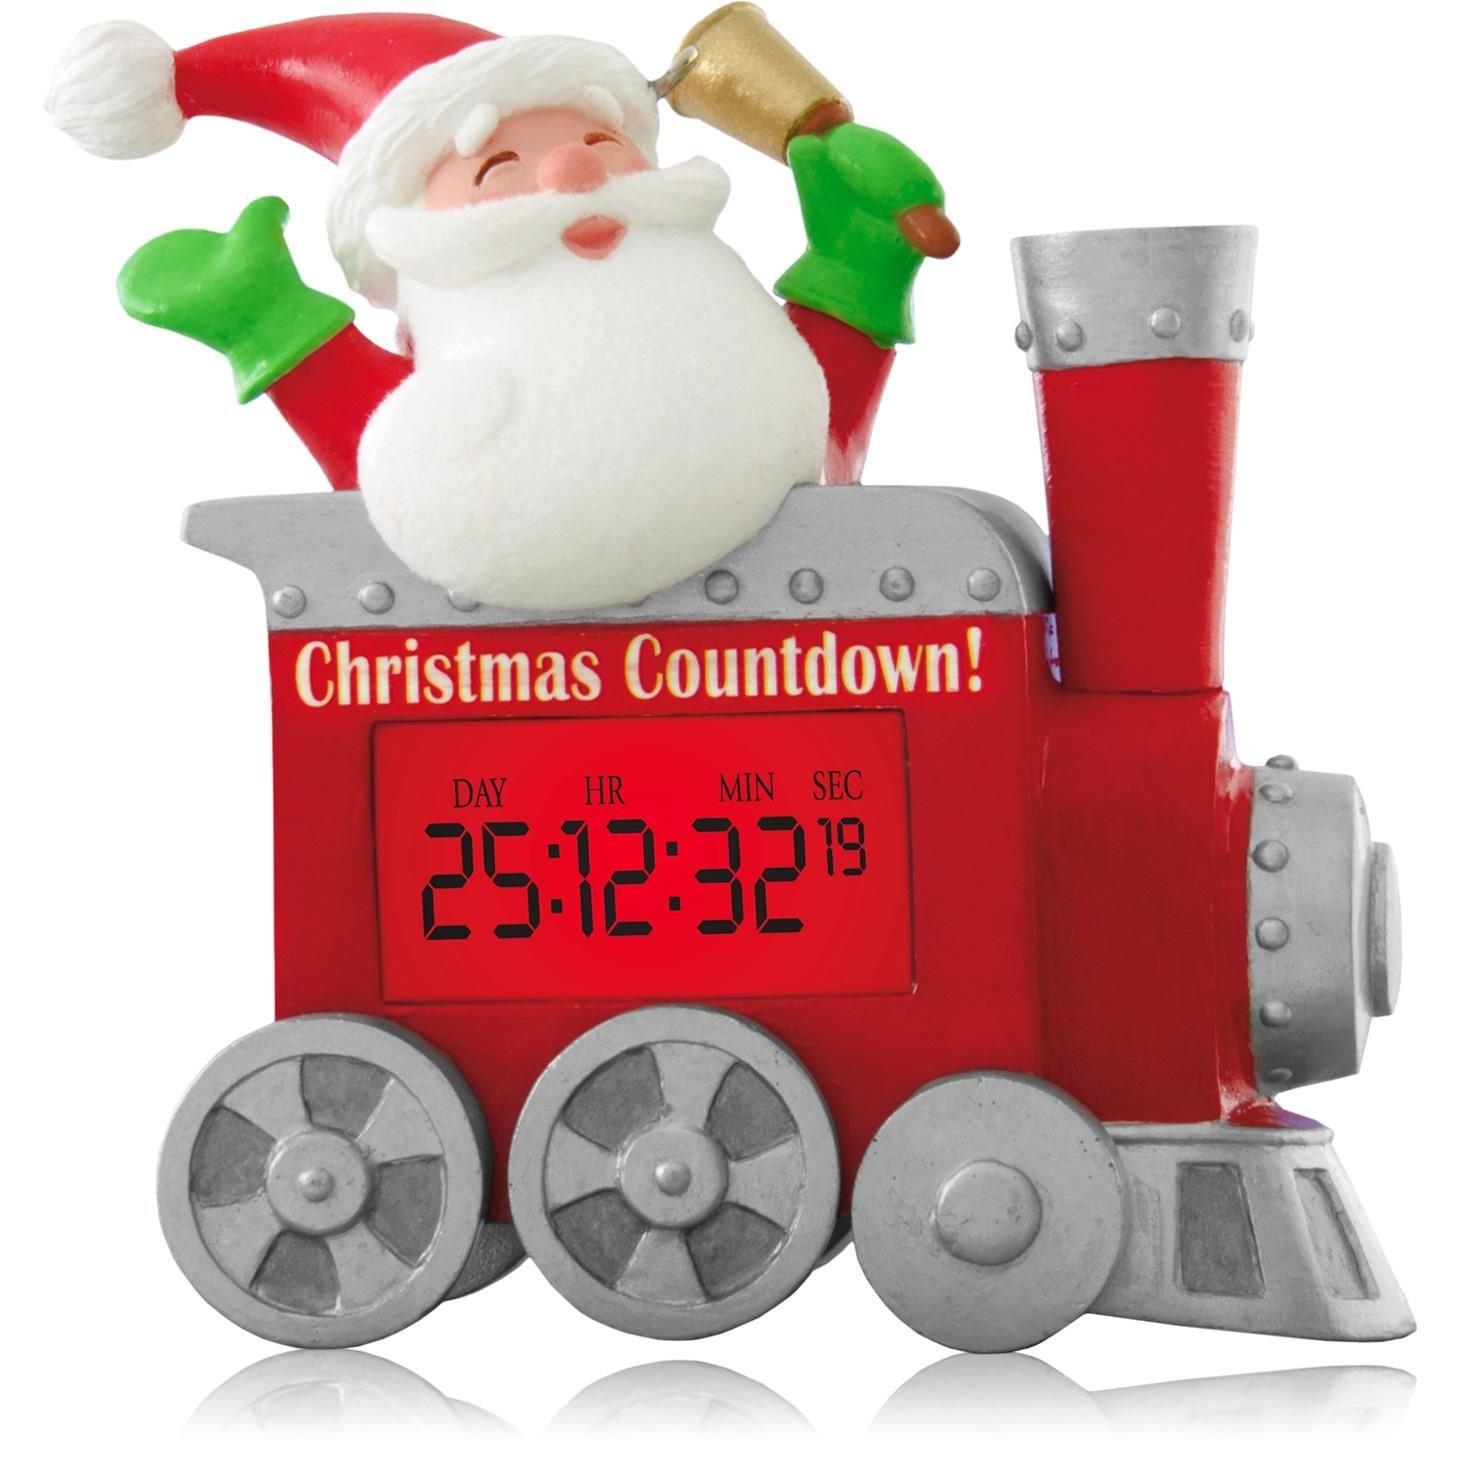 Amazon: Christmas Countdown!  2014 Hallmark Keepsake Ornament: Home &  Kitchen